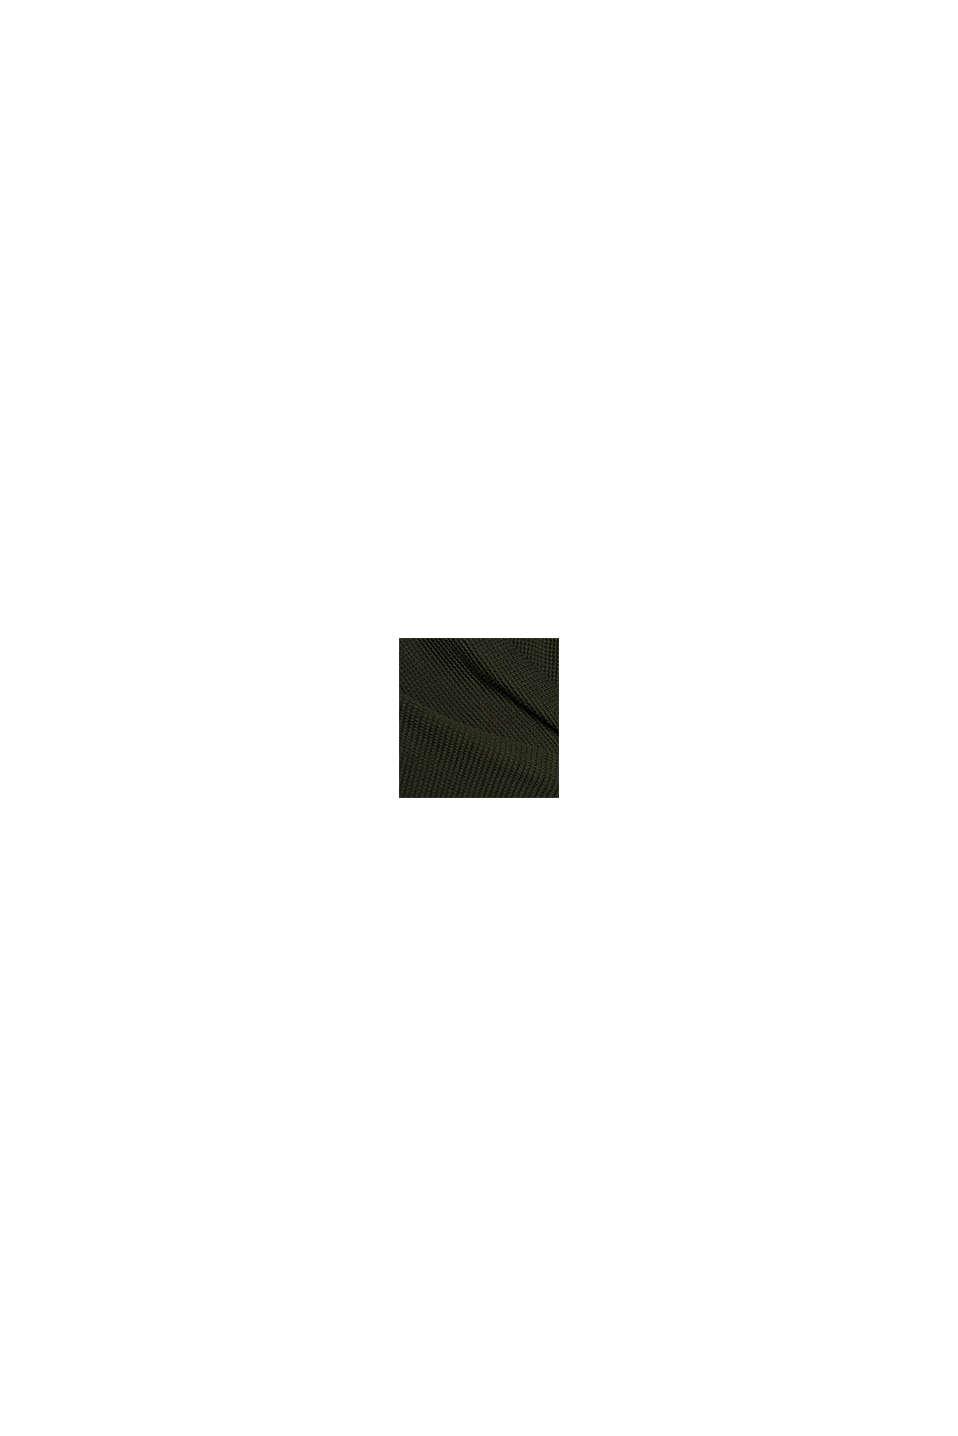 Cardigan med flagermusærmer og struktur, KHAKI GREEN, swatch